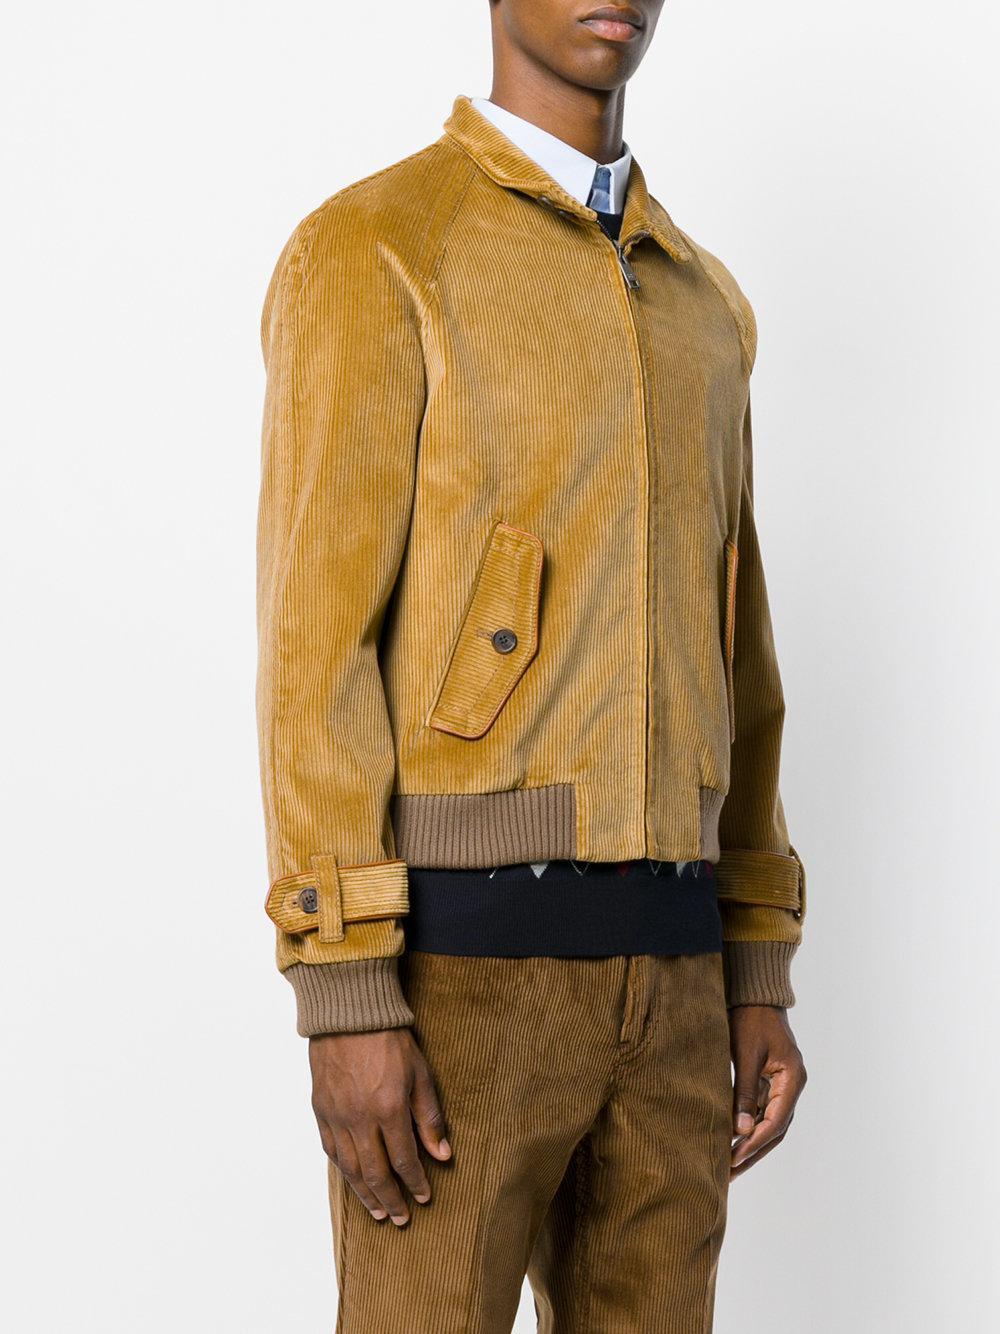 Prada Corduroy Jacket for Men